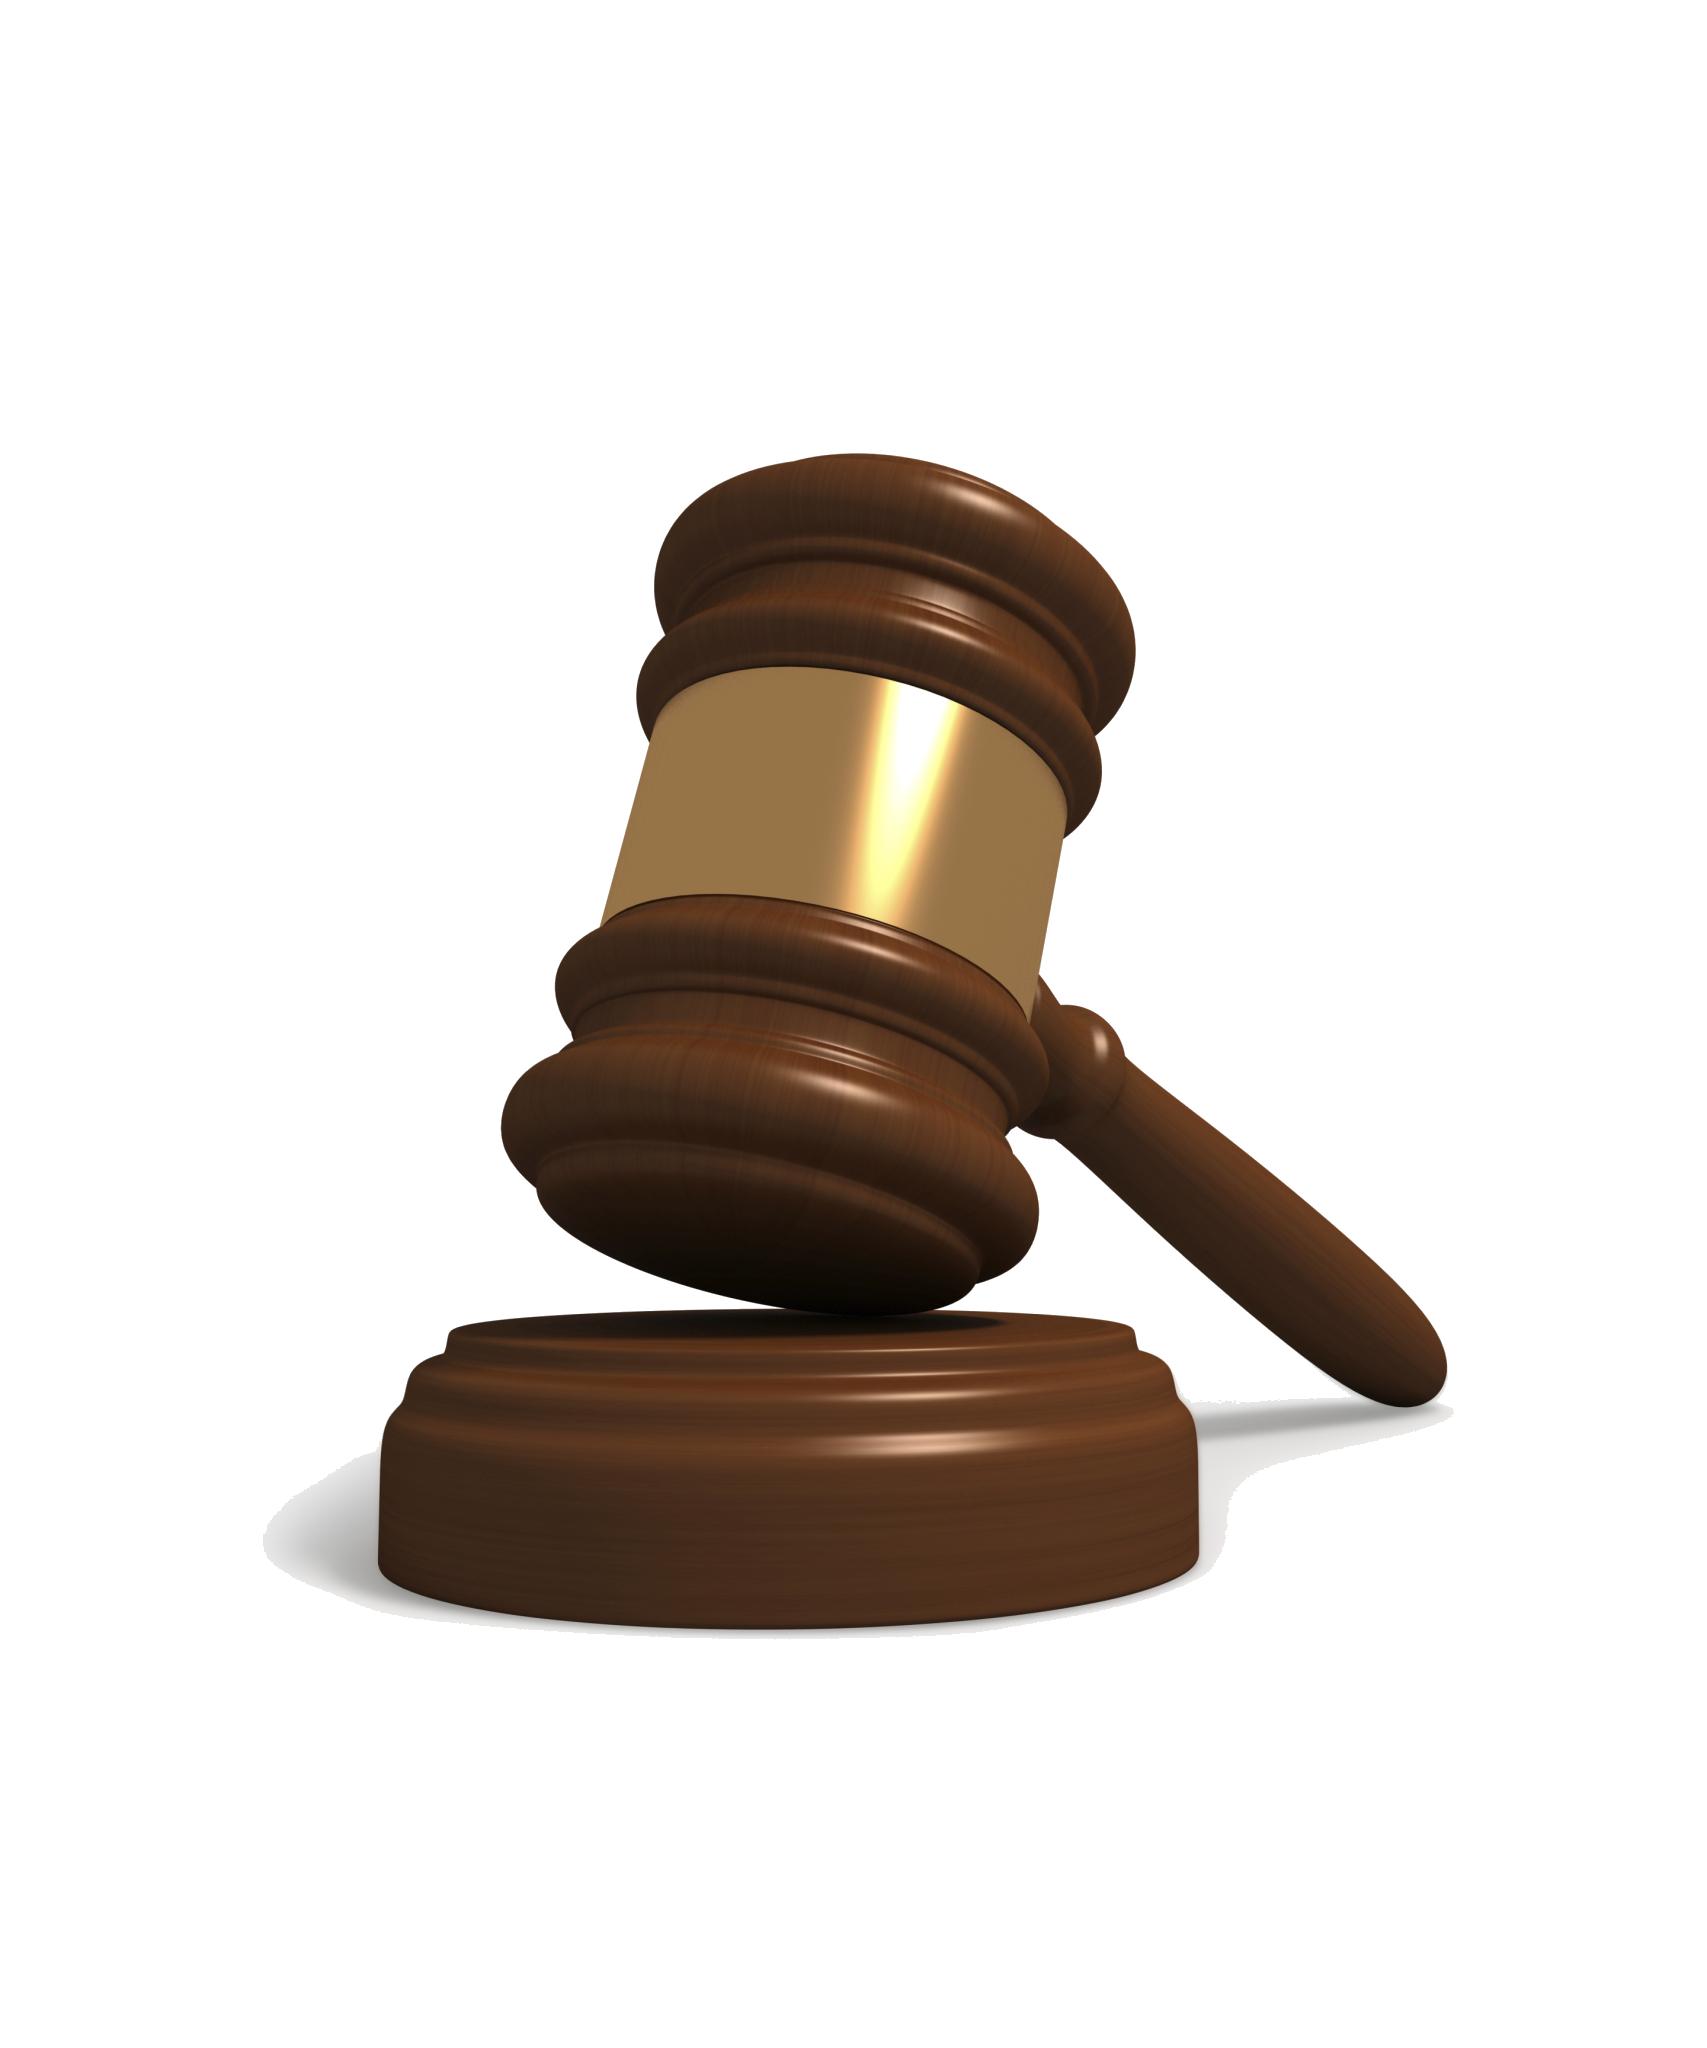 Court clipart transparent background. Gavel hammer png images